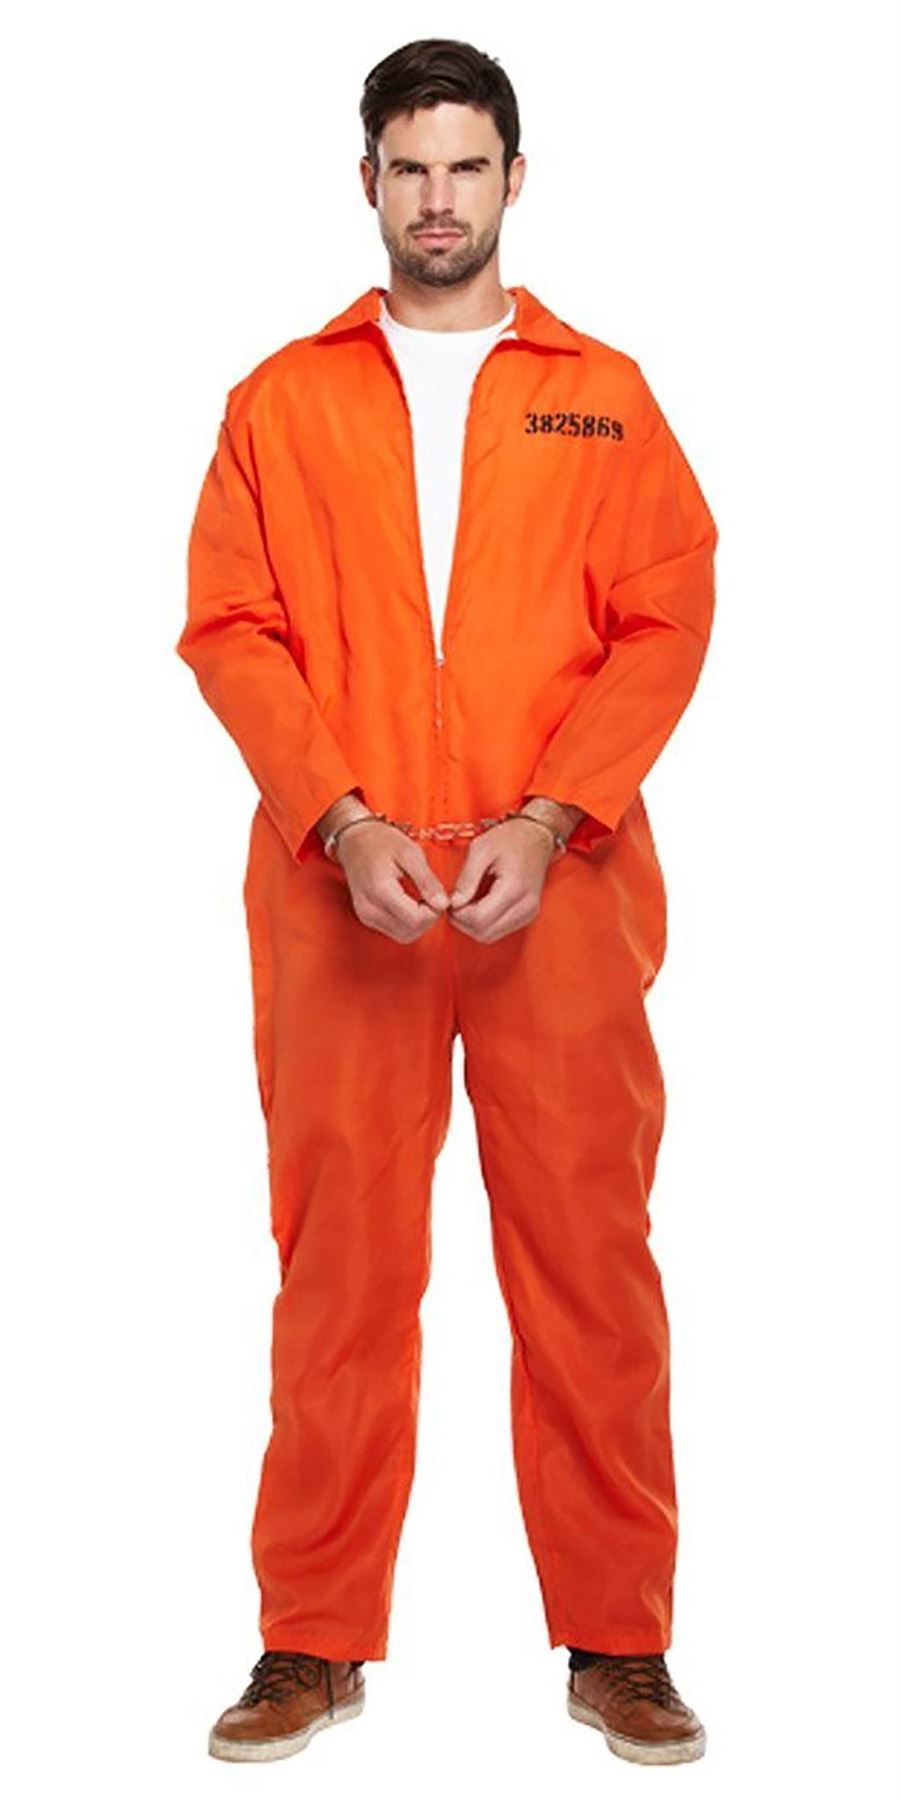 91a300d68fe9 Adults-Classic-Orange-Prisoner-Jumpsuit-Prison-Inmate-Fancy- Sc 1 St EBay